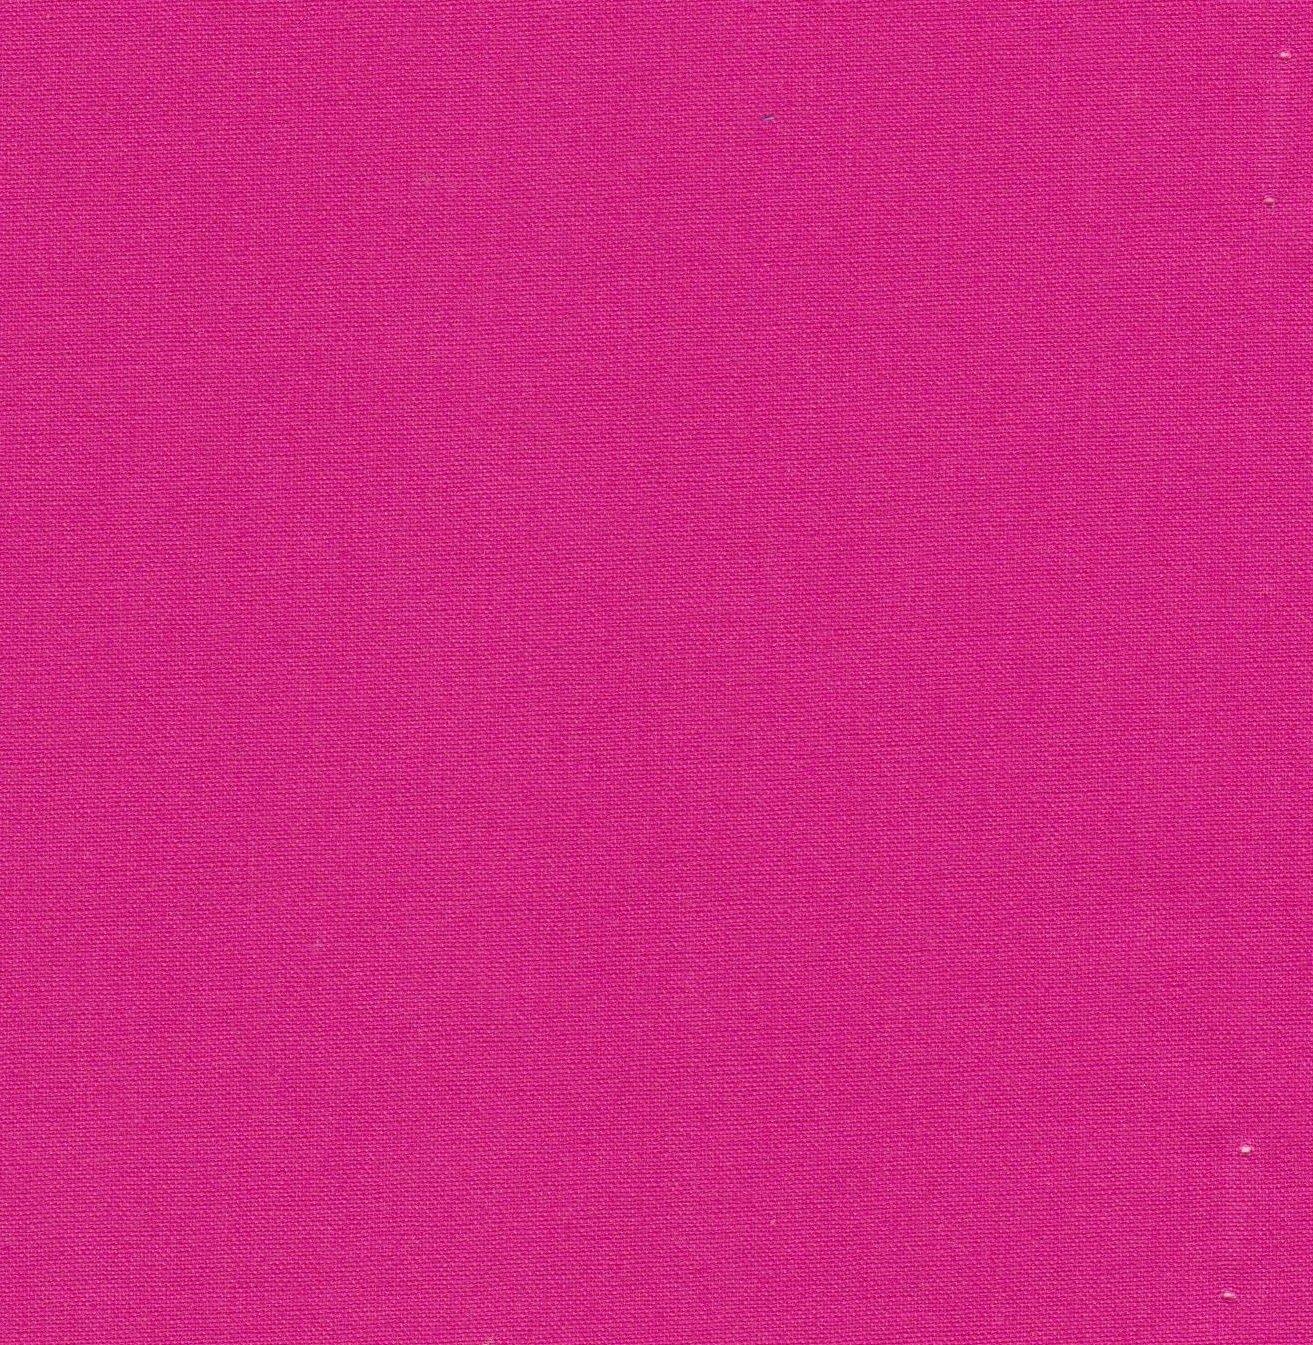 Americana Solids 62375 Dark Pink